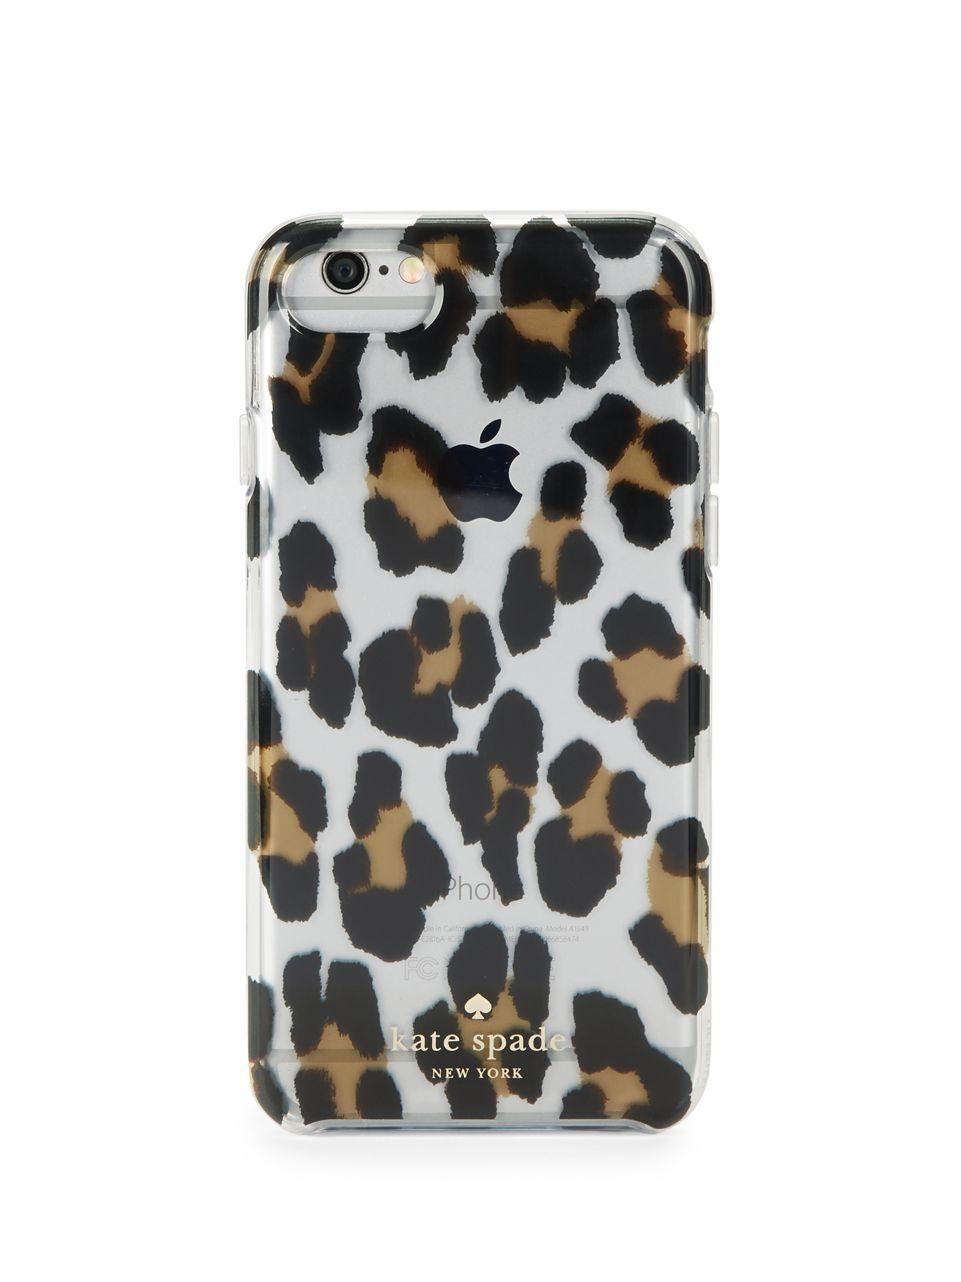 Leopard Iphone  Case Kate Spade